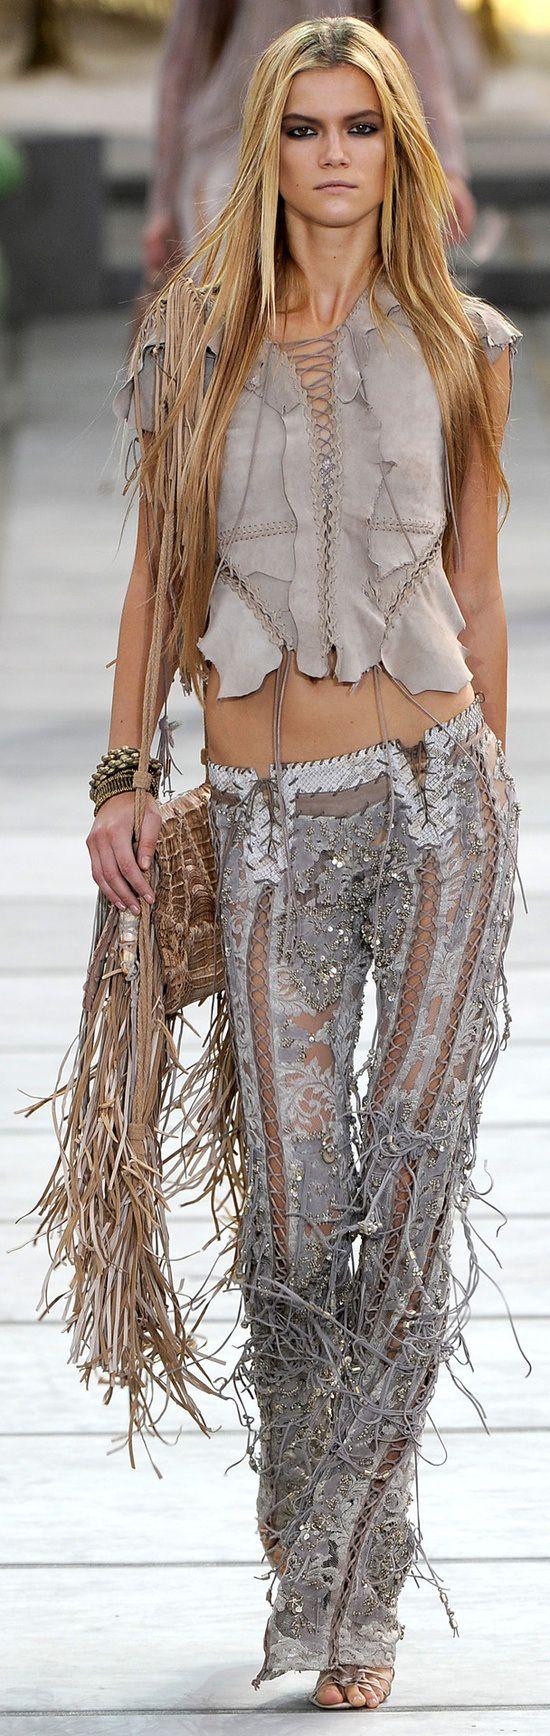 Roberrto Cavalli: Fantastic outfit #bohemian ☮k☮ #boho